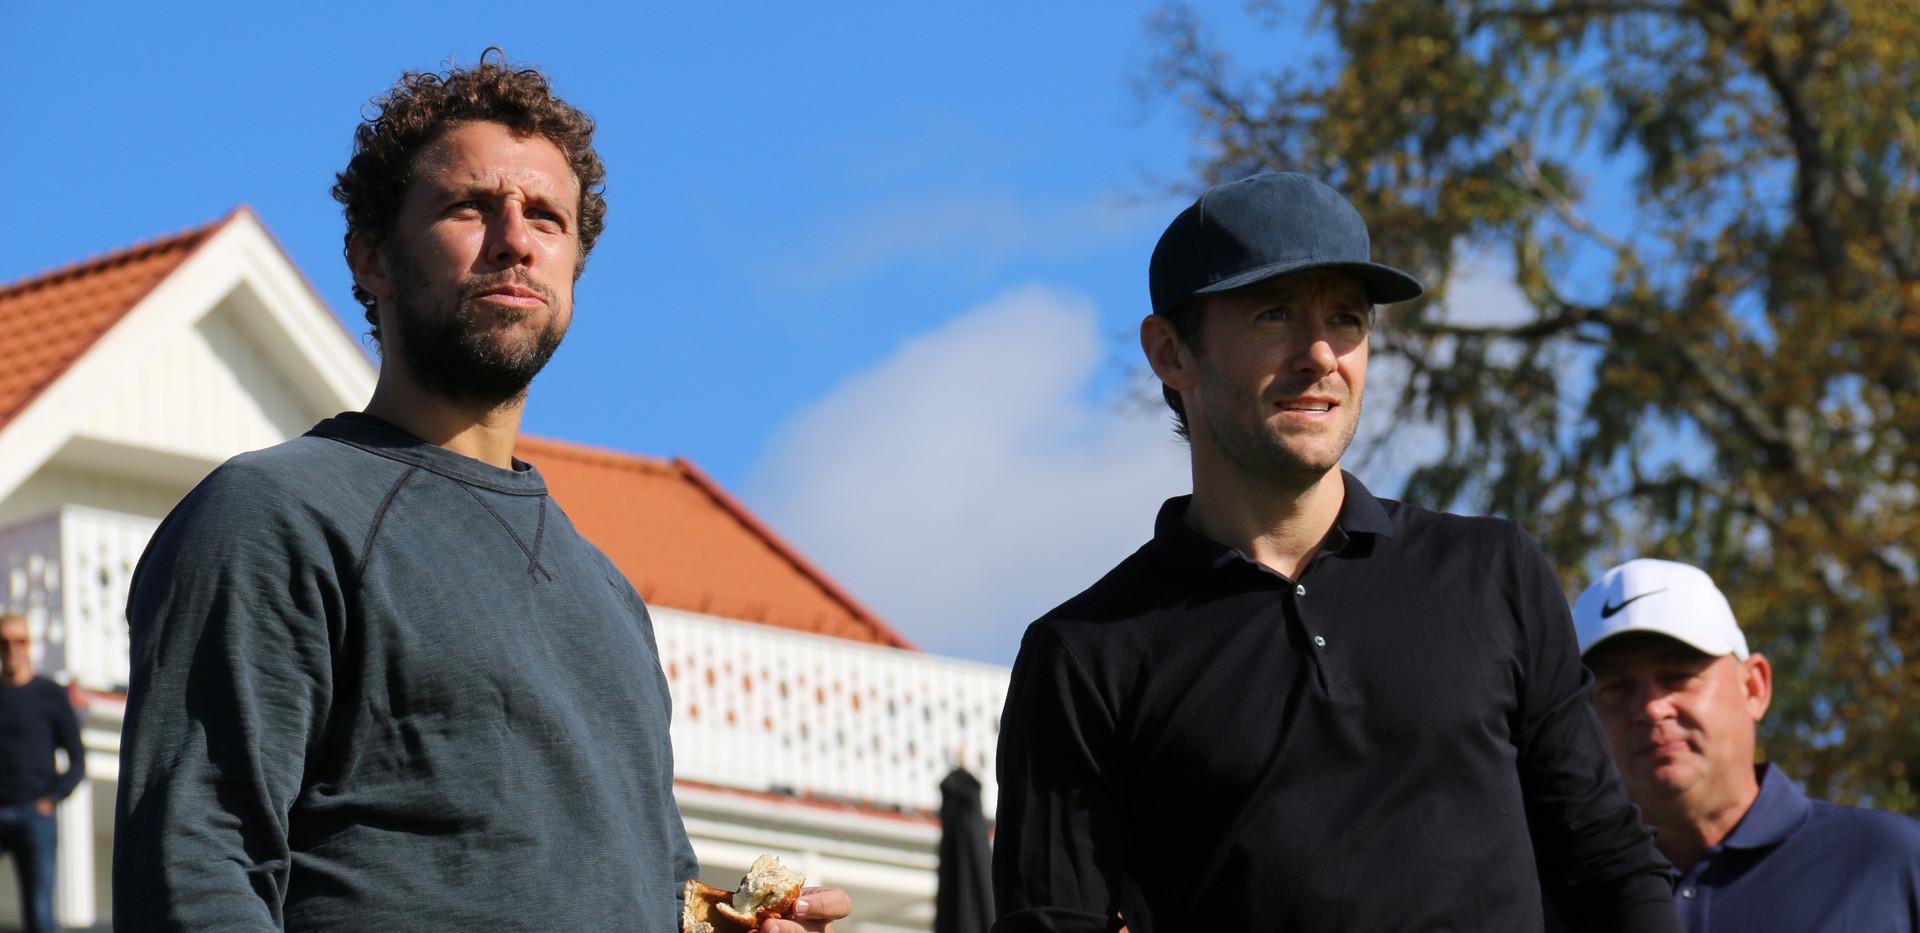 Thomas Gullestad og Freddy Dos Santos